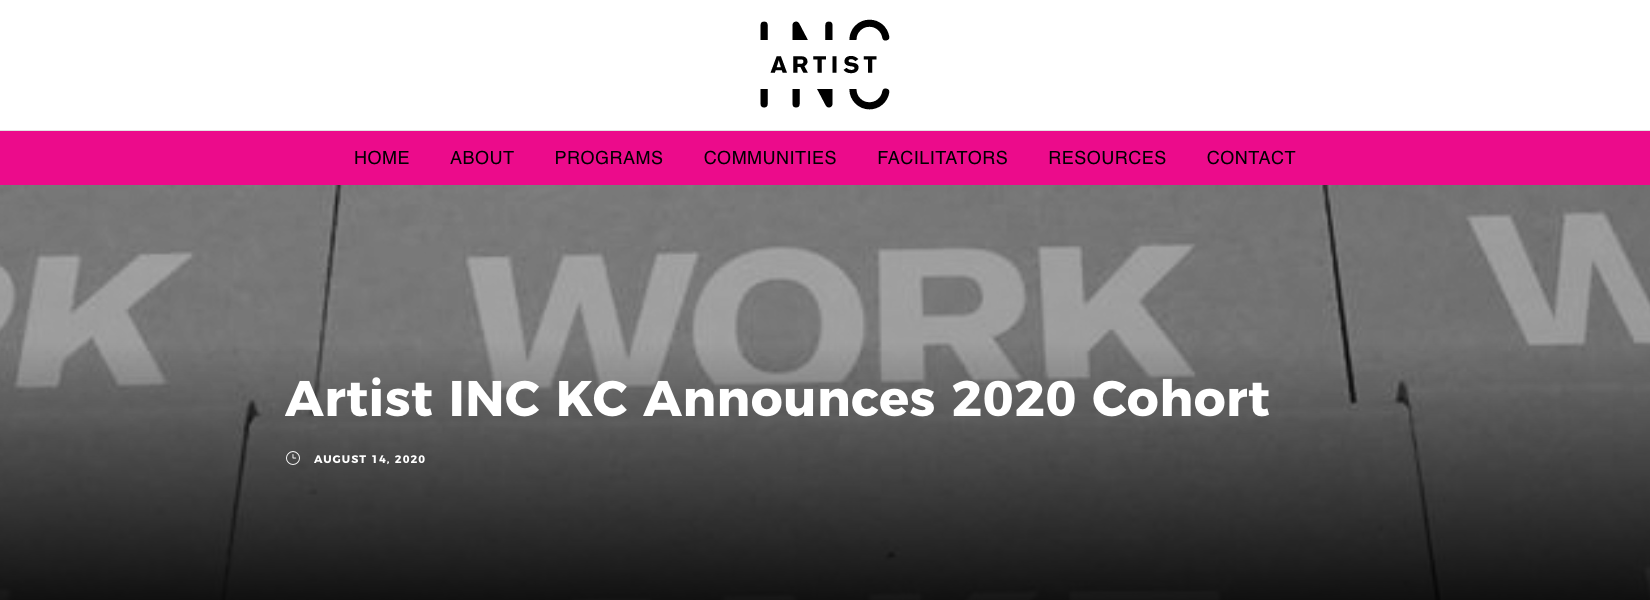 Artist Inc 2020 Cohort